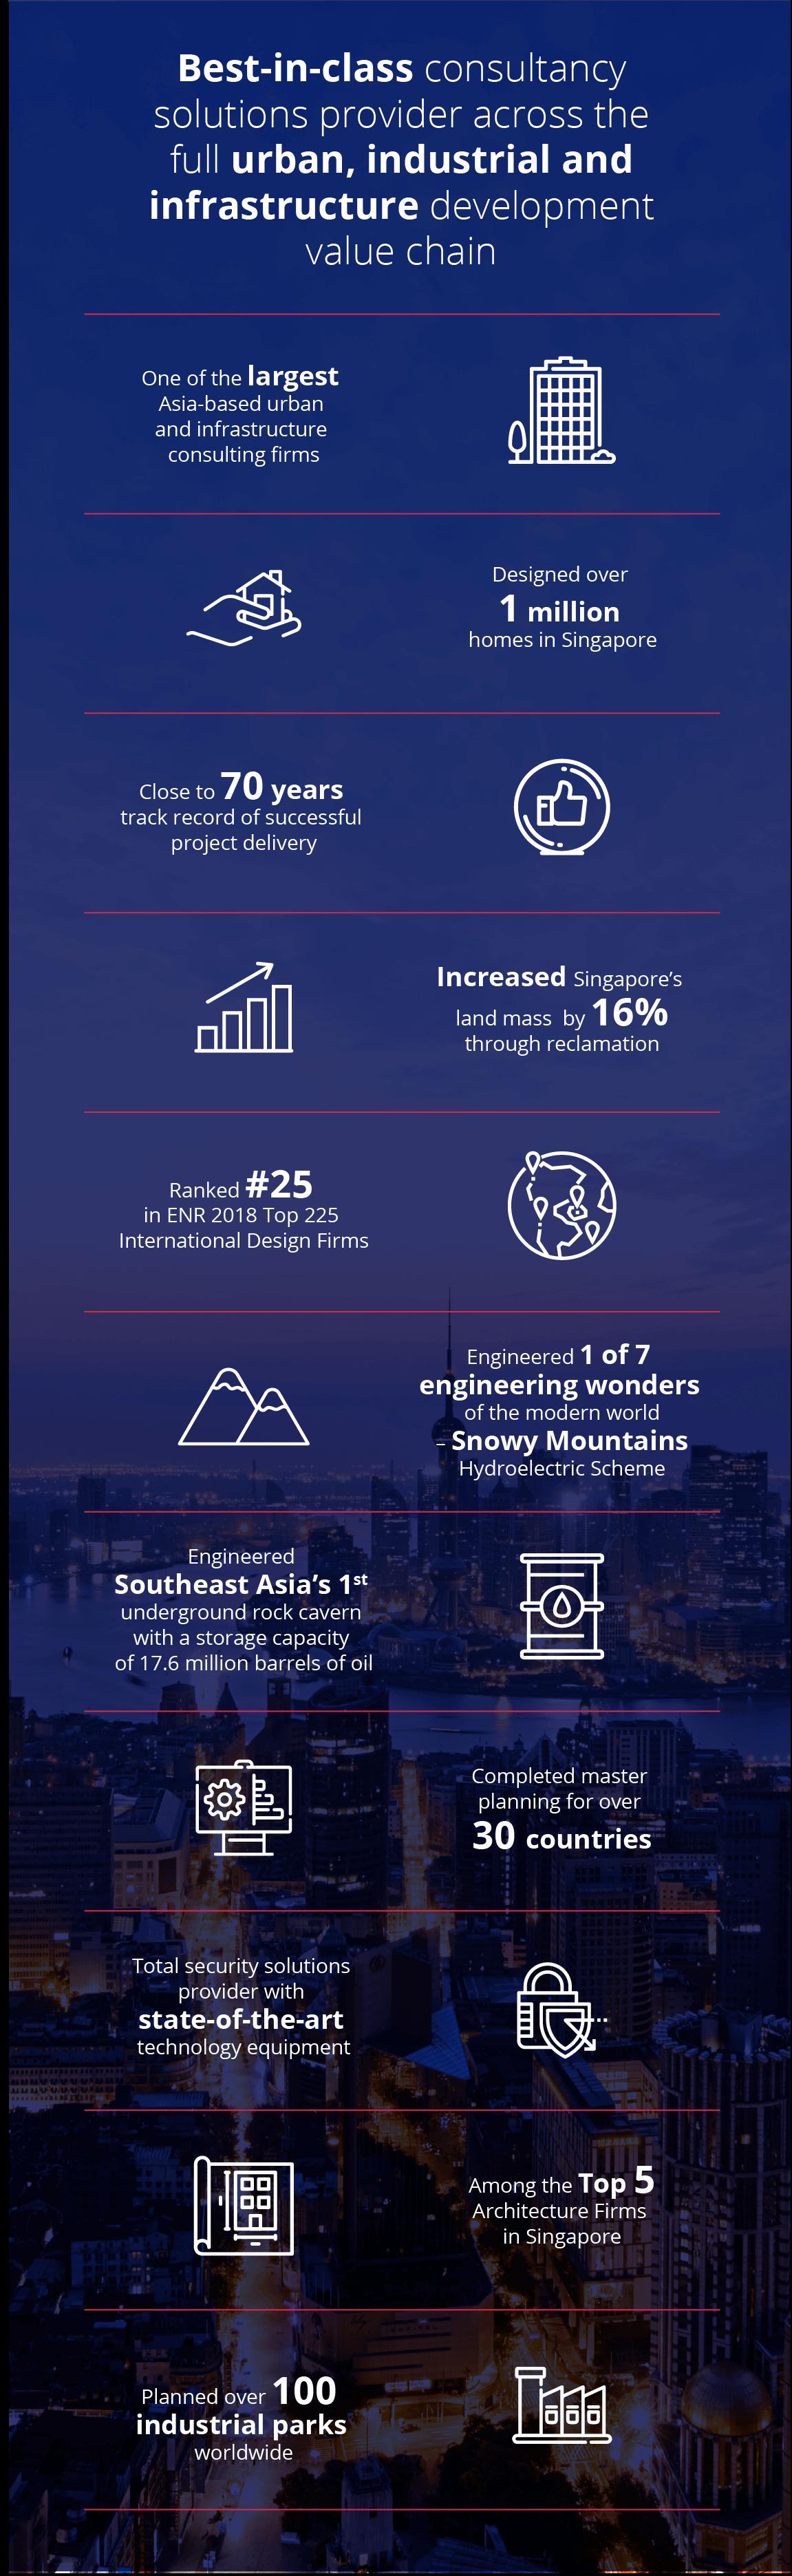 SURBANA JURONG - Asia-based urban & infrastructure